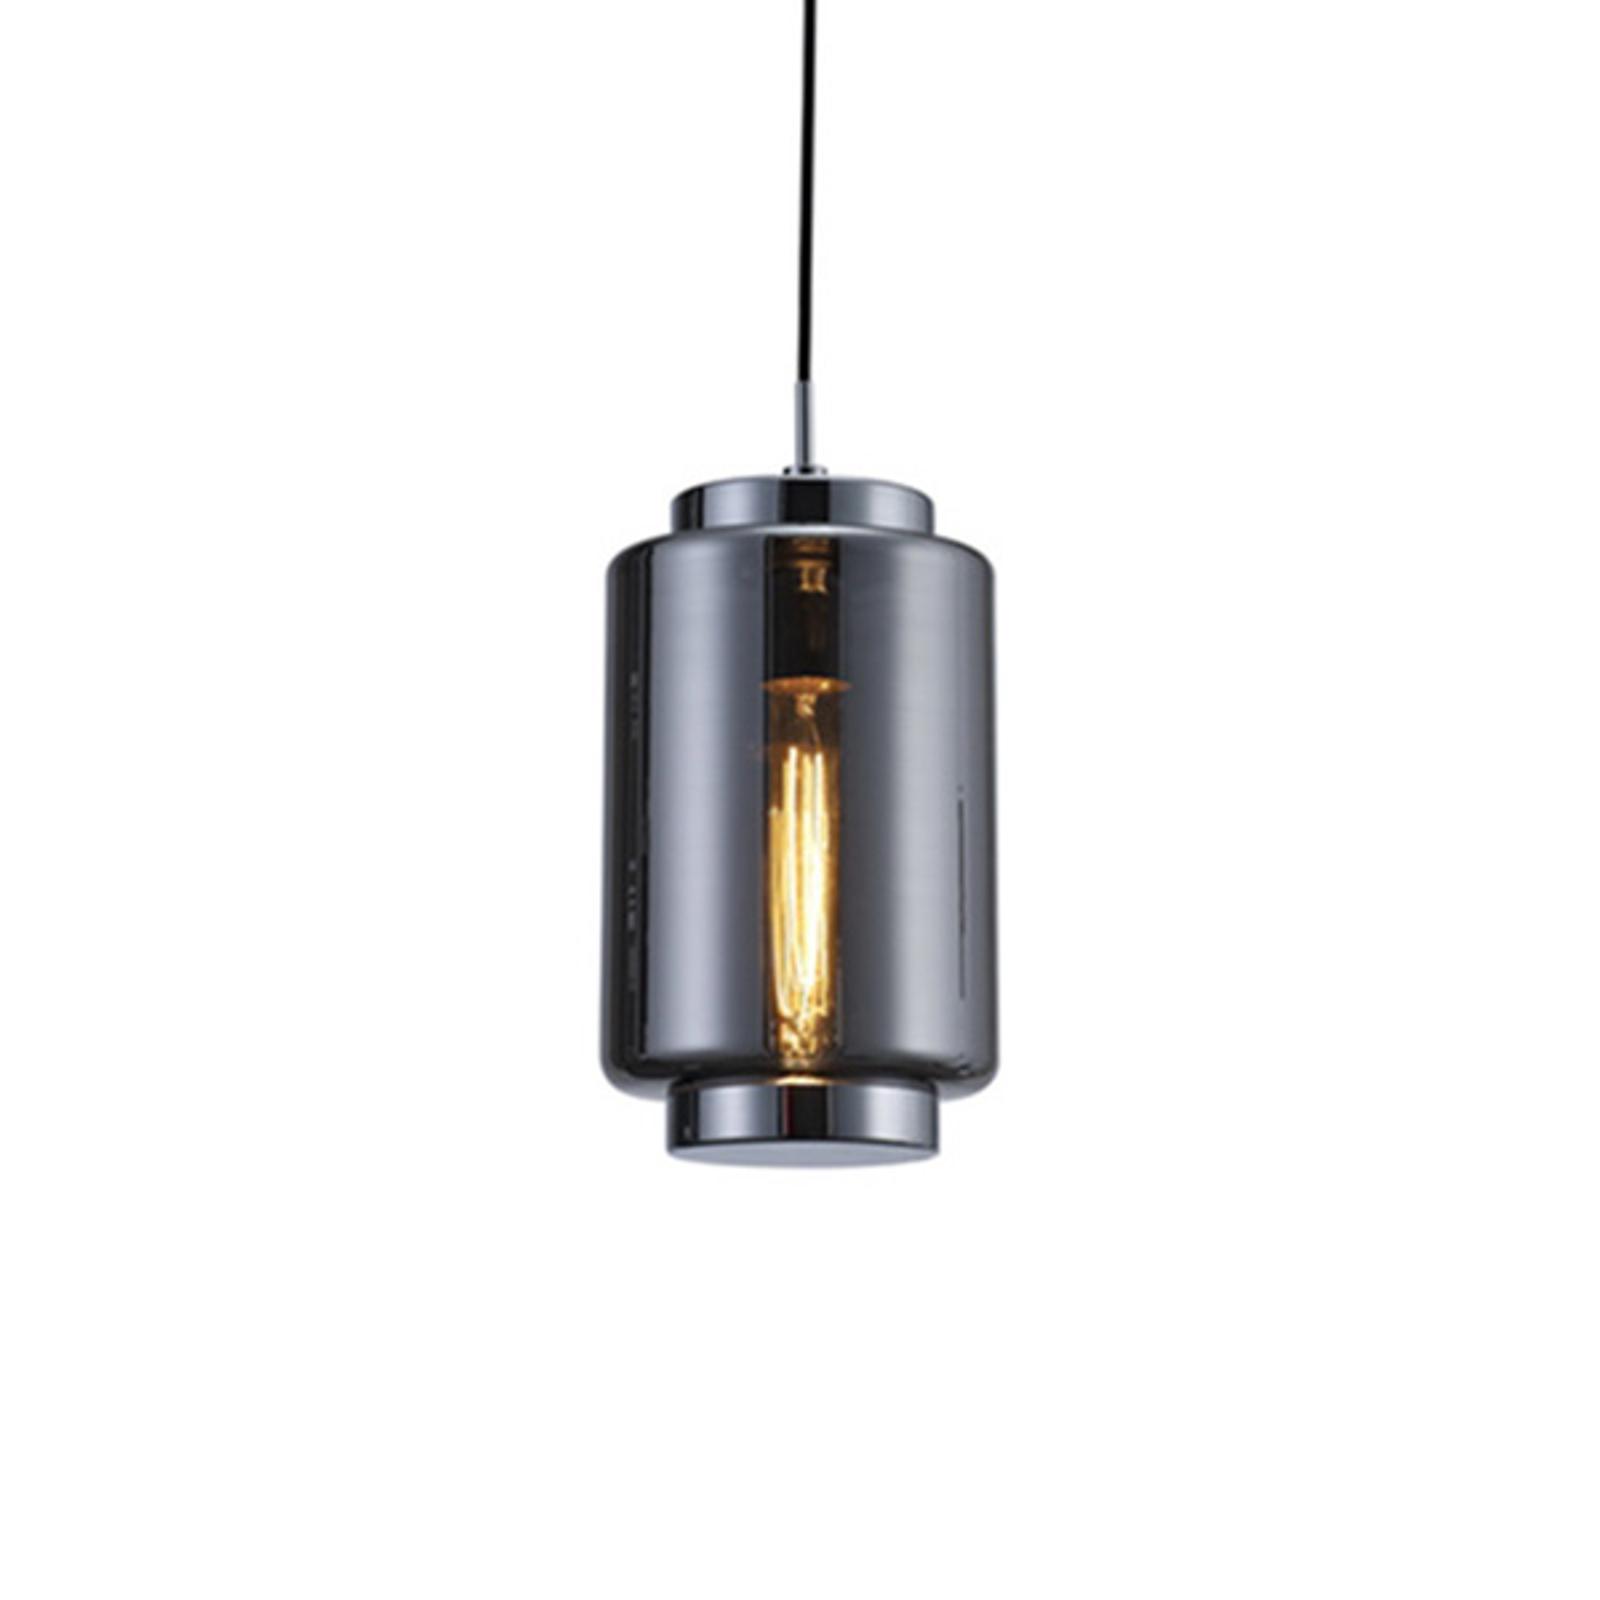 Hanglamp Jarras hoogte 34,5 cm, chroom